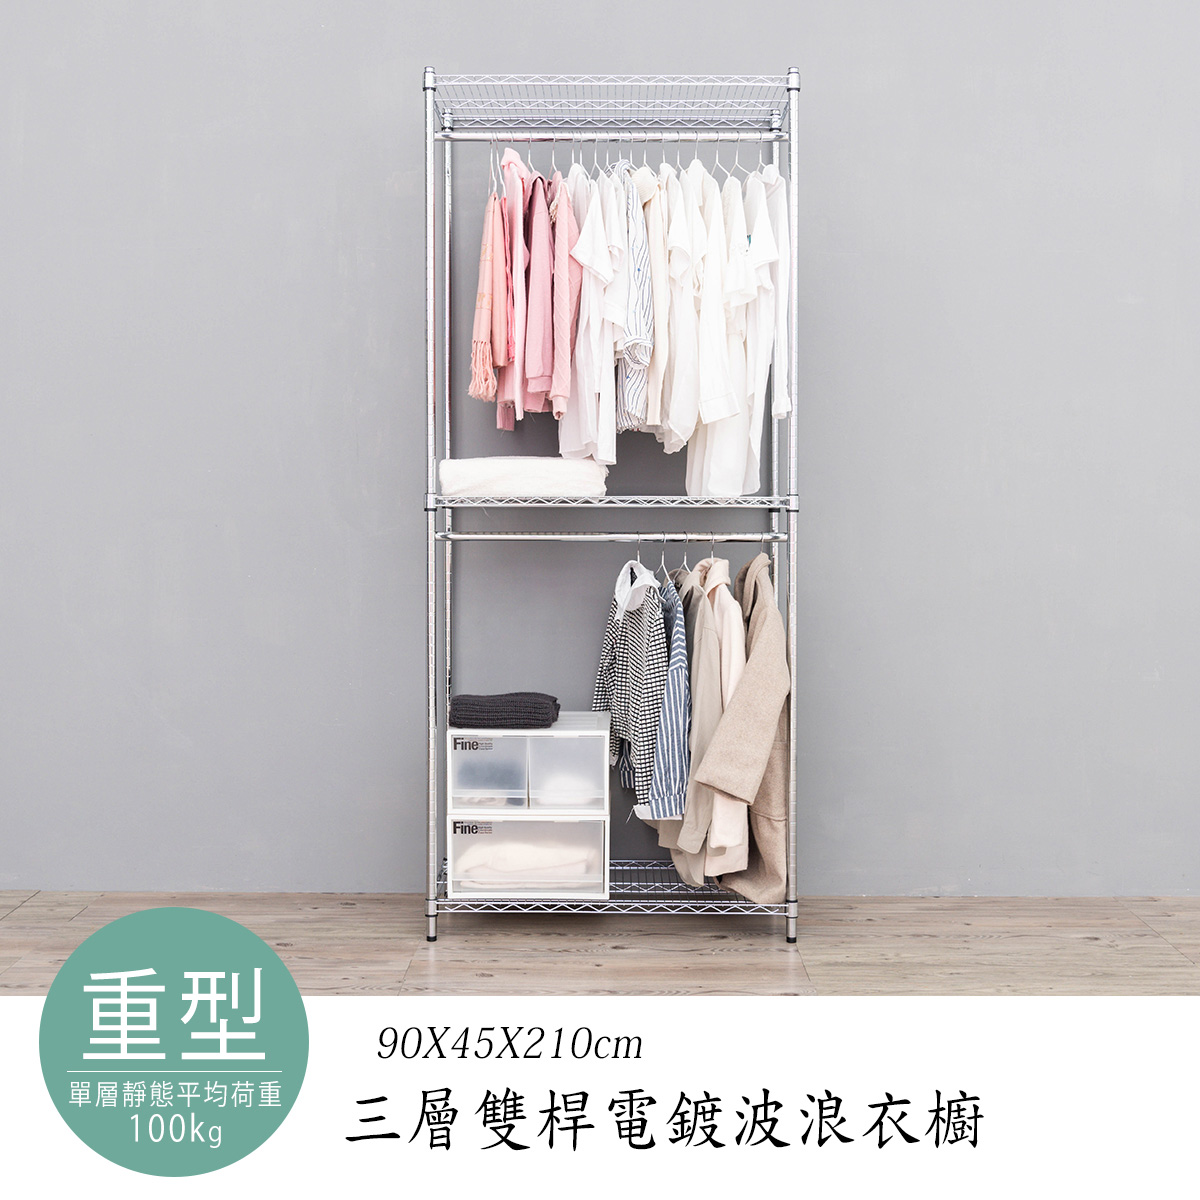 【dayneeds】90X45X210cm 荷重型三層雙桿電鍍波浪衣櫥